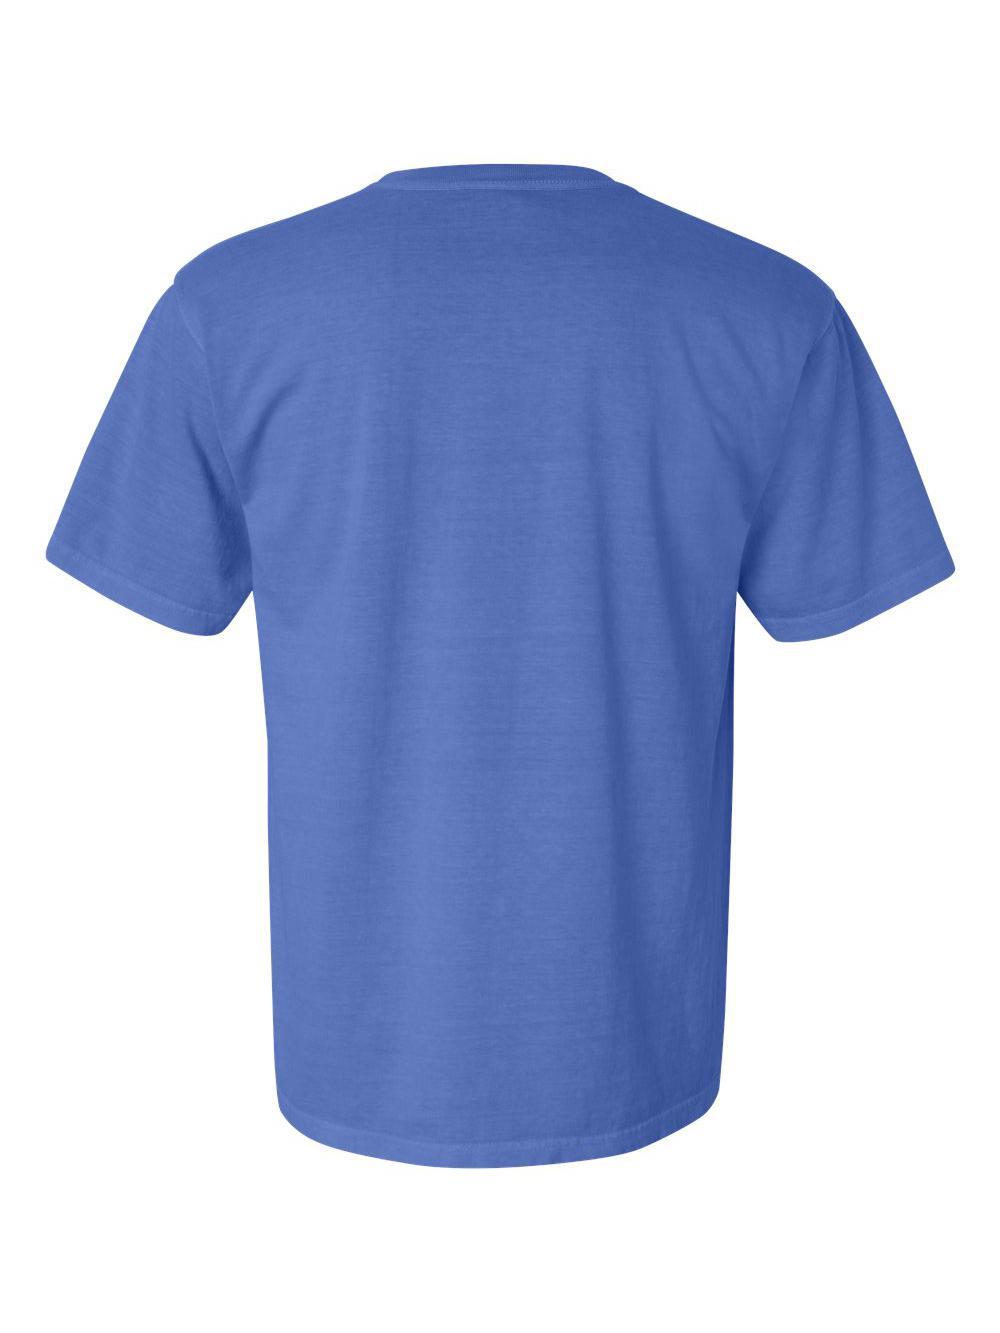 Comfort-Colors-Garment-Dyed-Heavyweight-Ringspun-Short-Sleeve-Shirt-1717 thumbnail 52